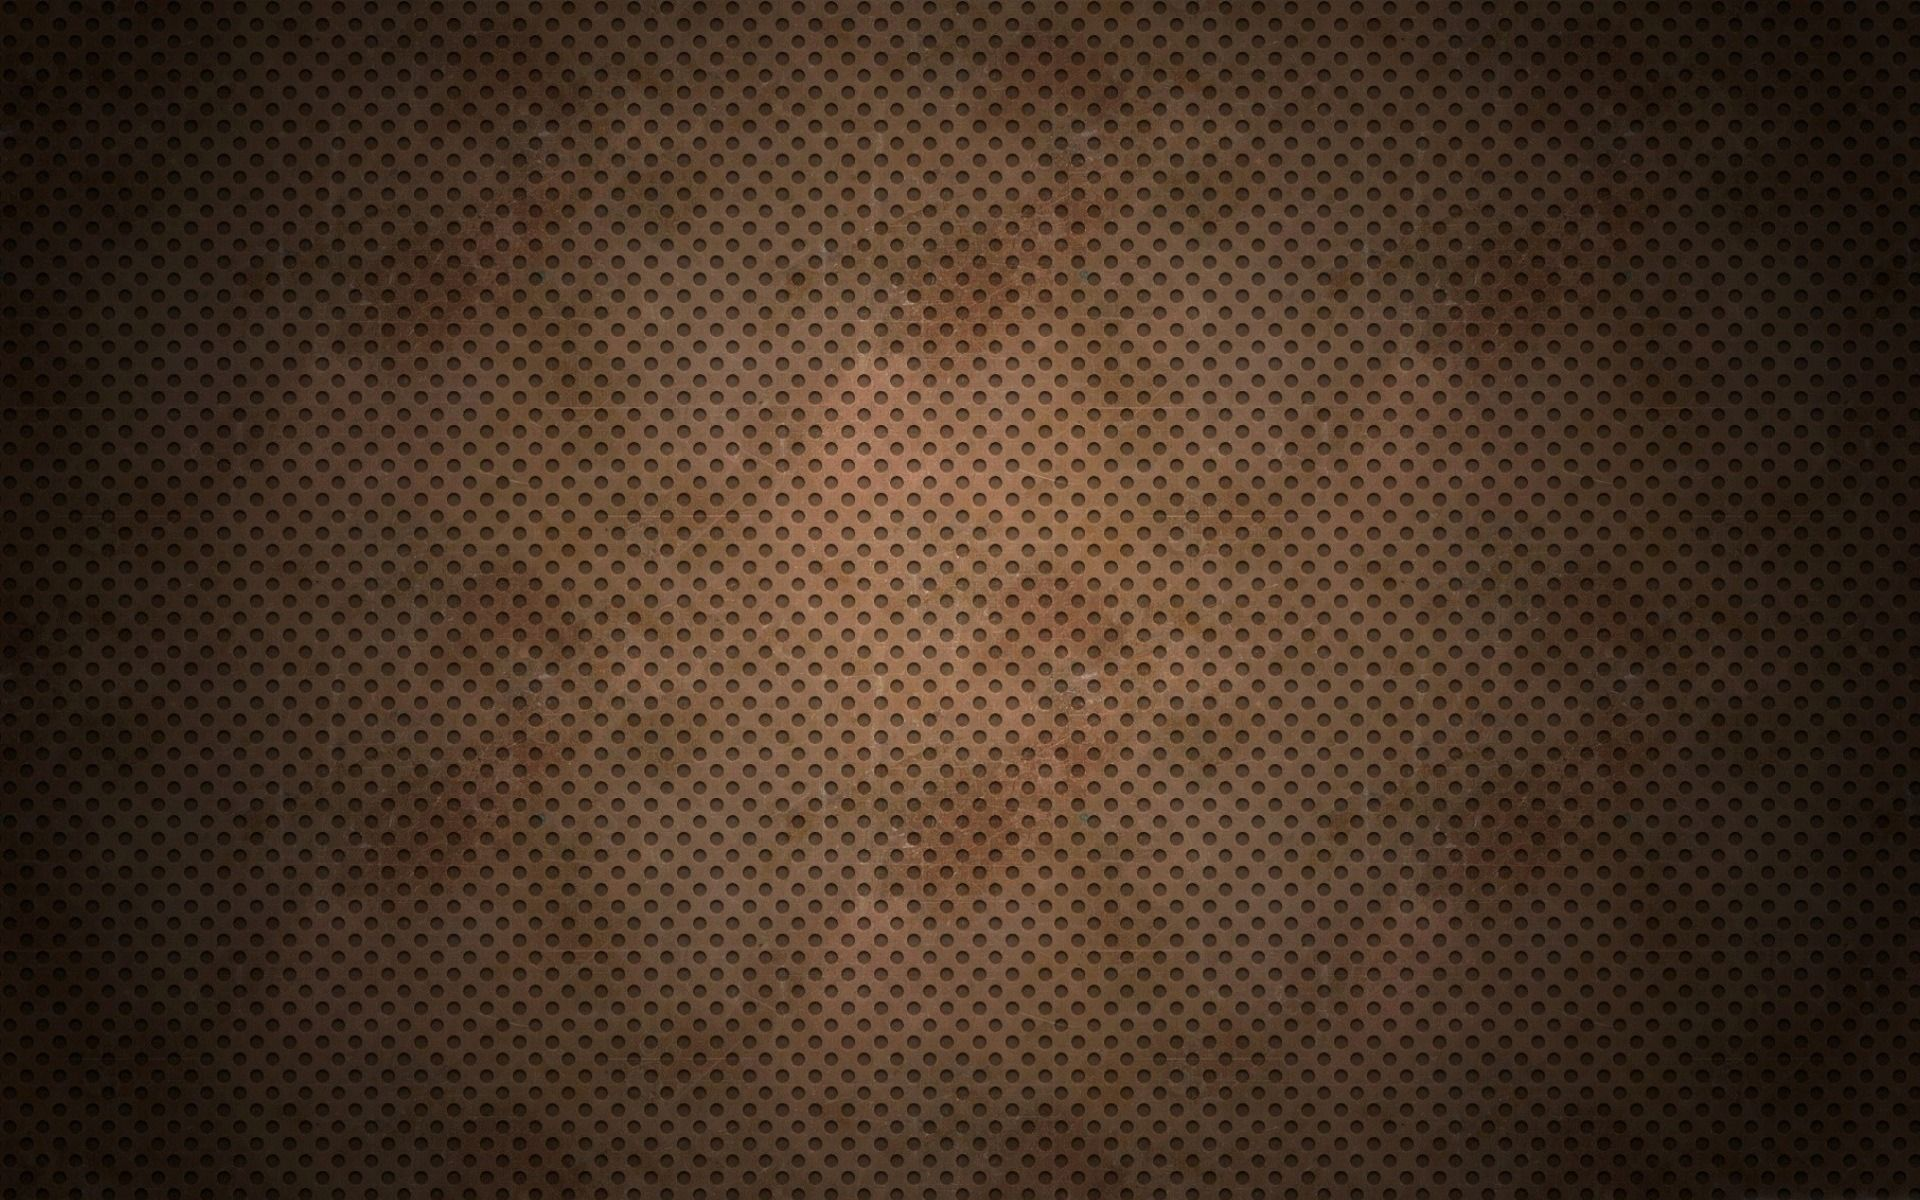 Free Desktop Wallpapers HD Group 1920×1200 Free HD Backgrounds (35 ...